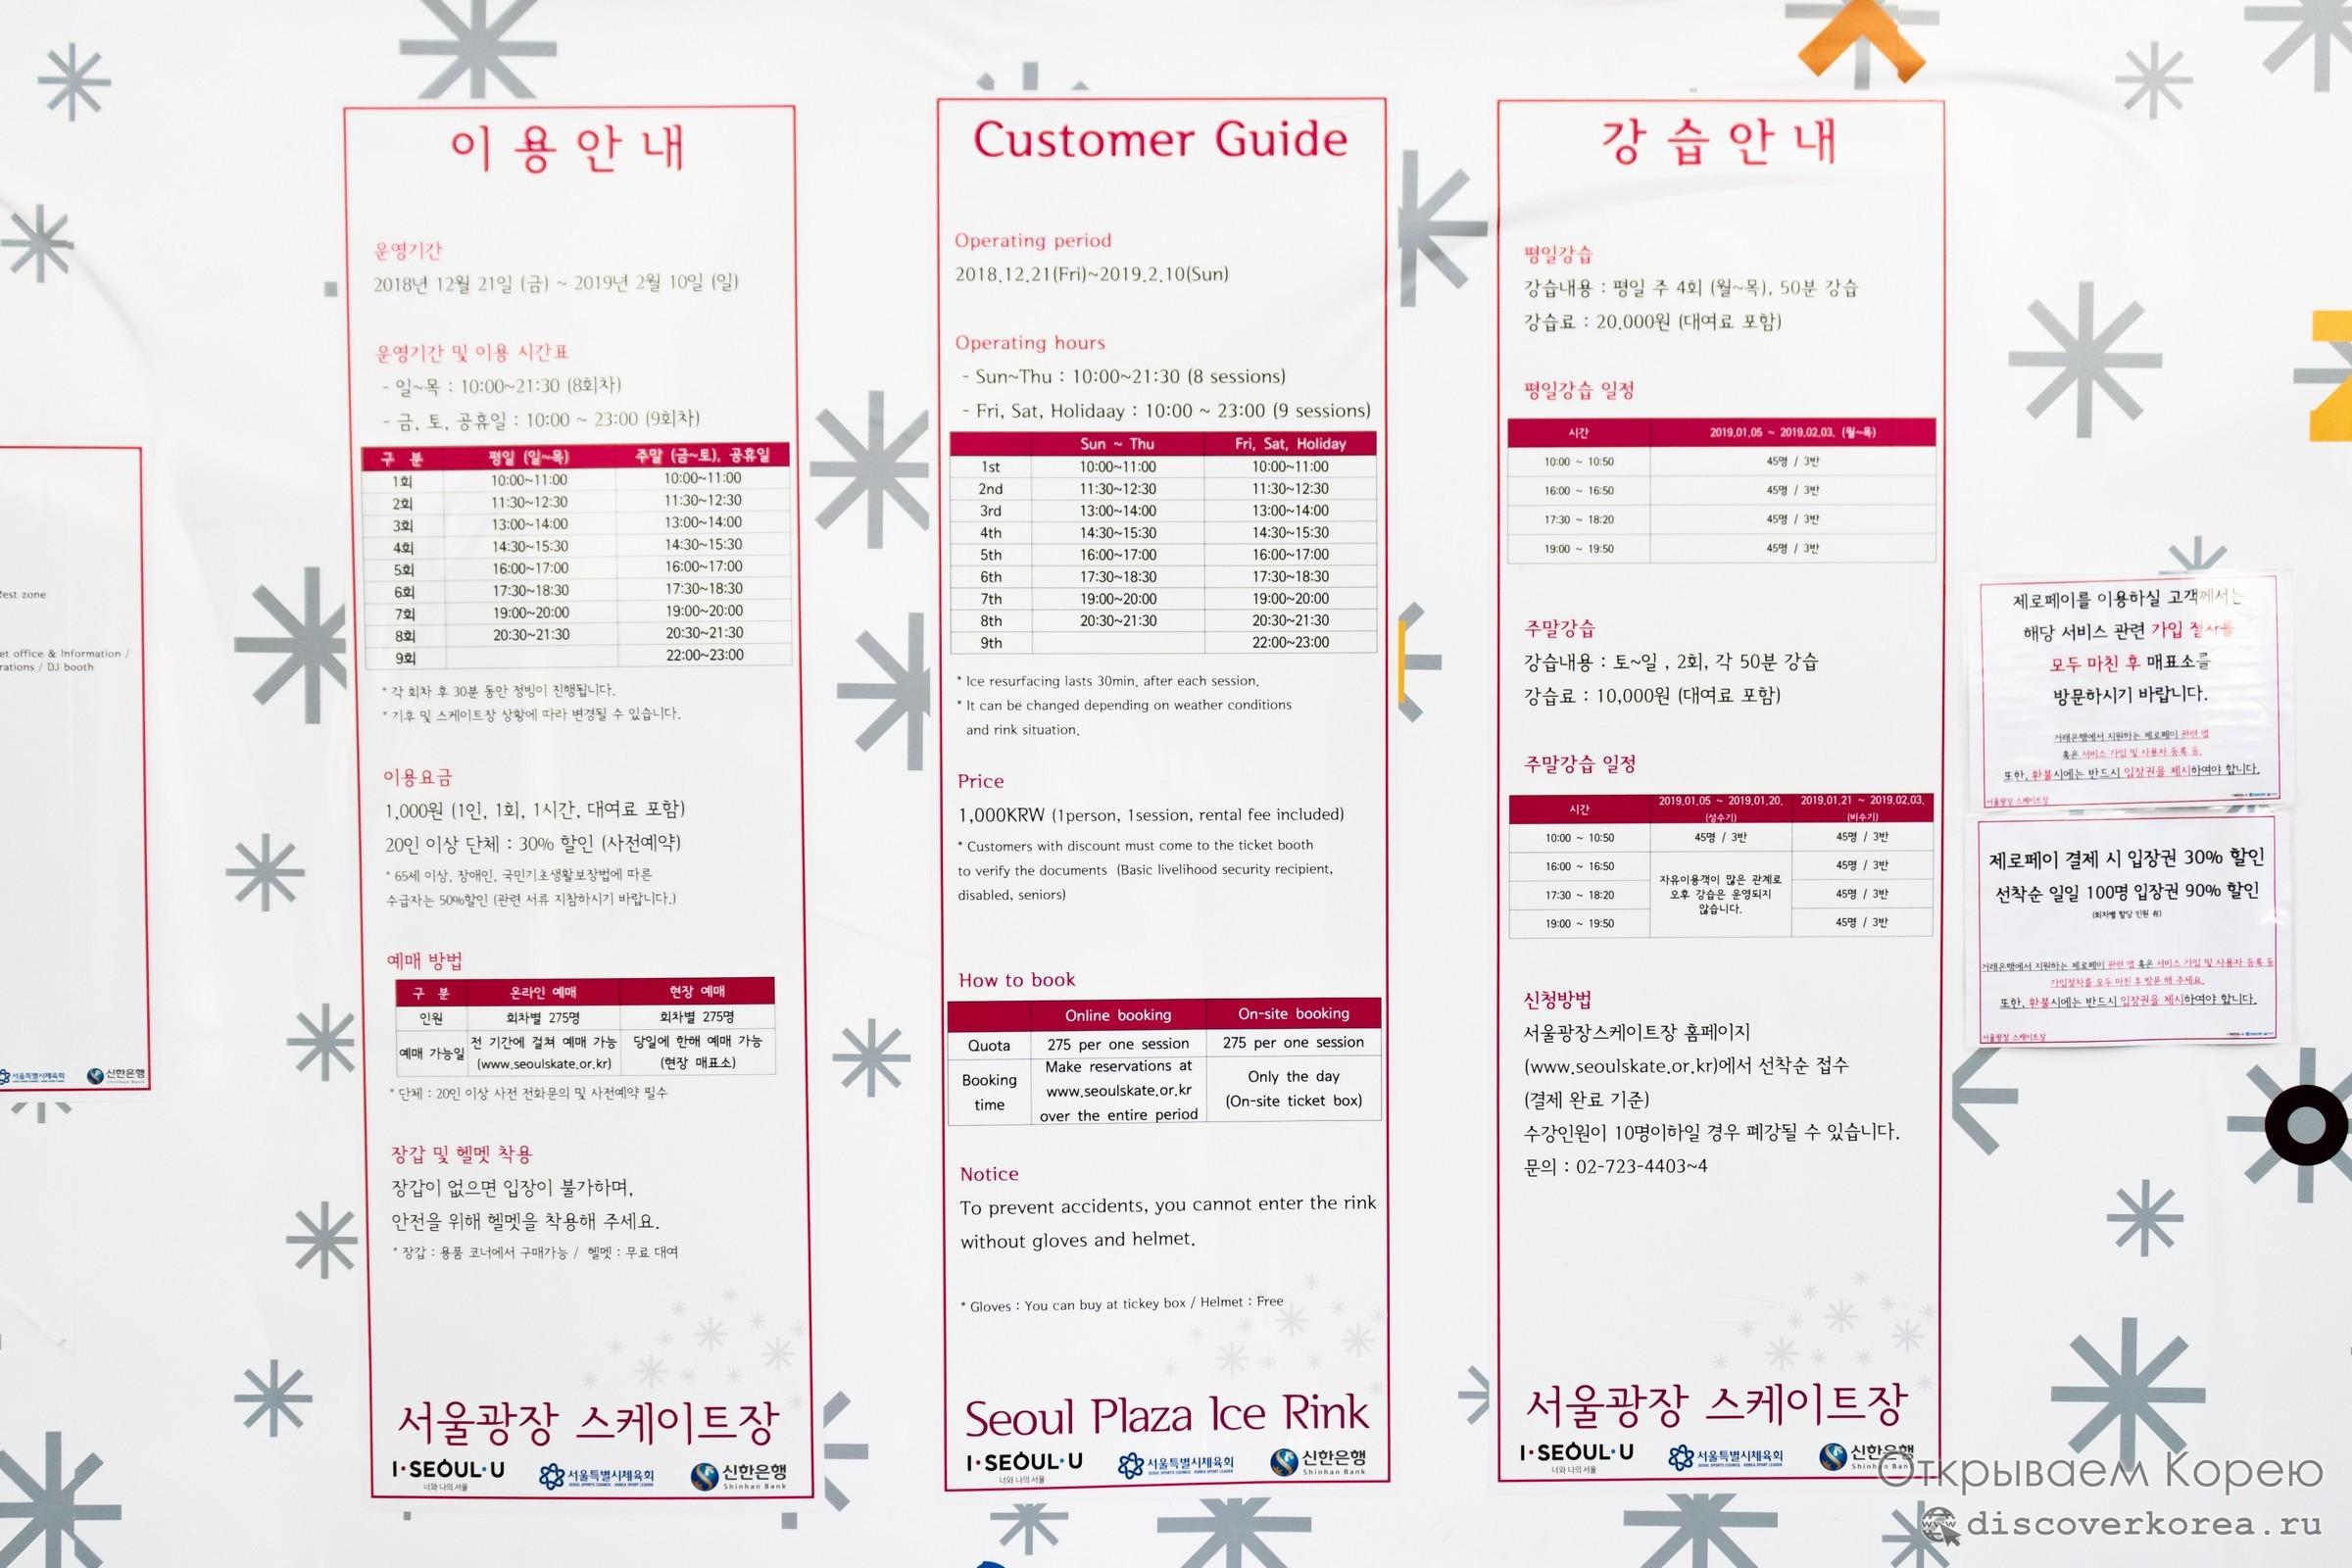 Ледовый катов в Сеуле, условия проката и правила